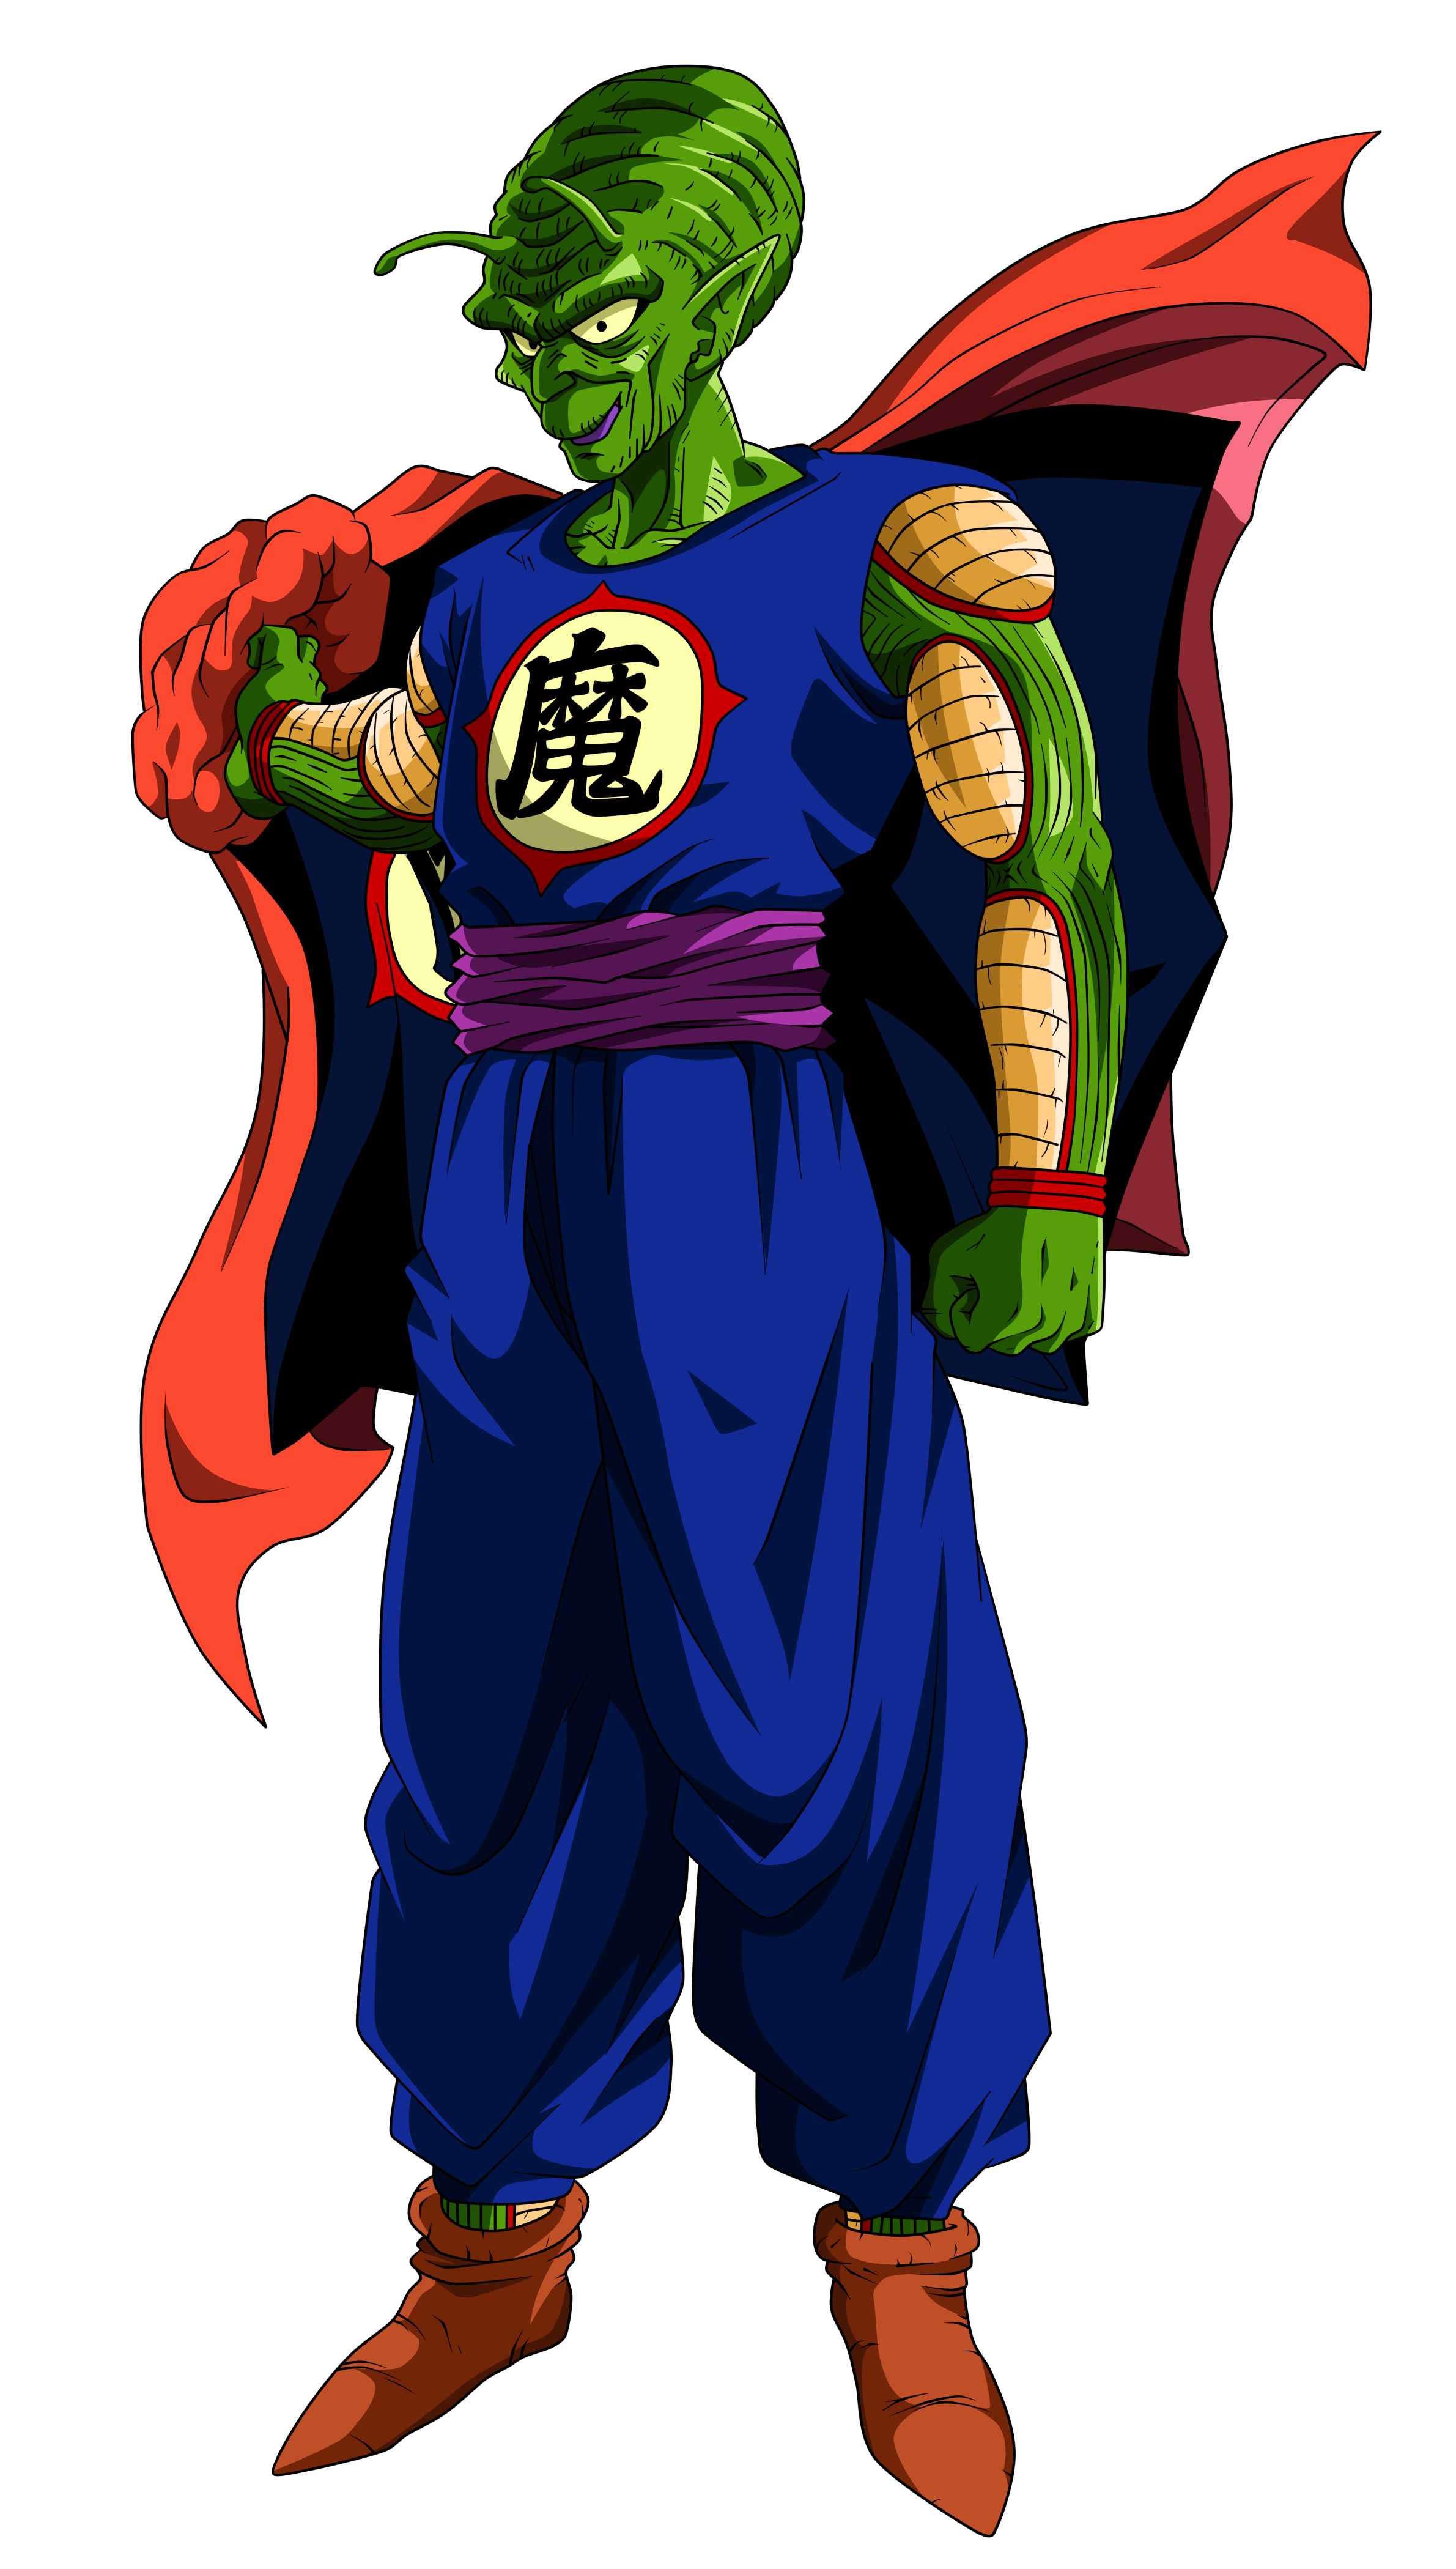 Piccolo Diamoah